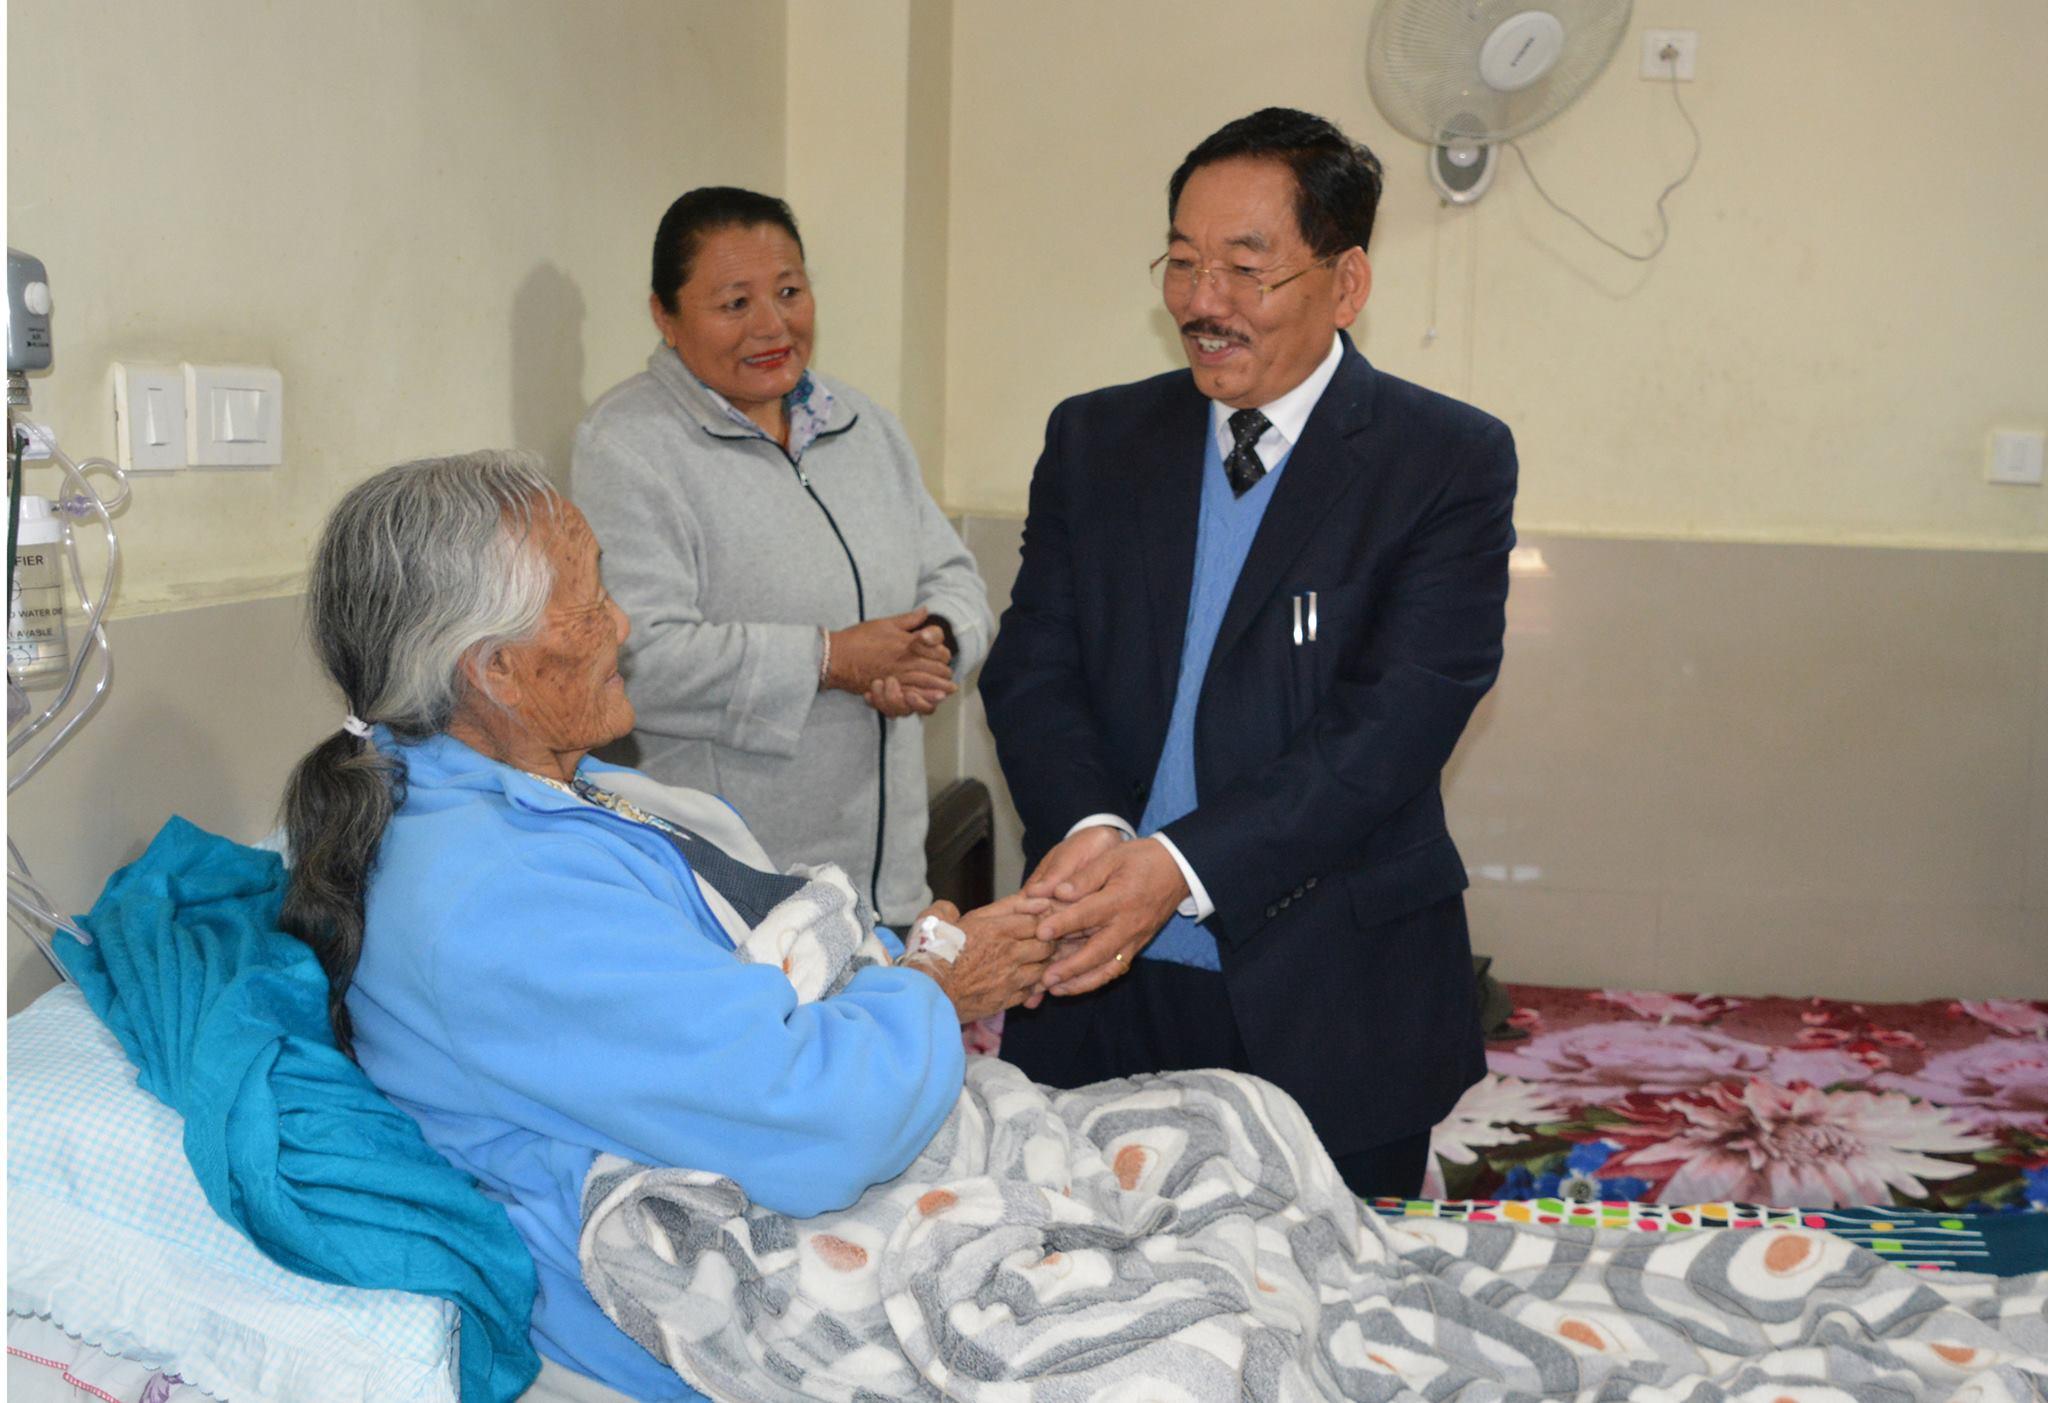 सिक्किम के मुख्यमंत्री पवन कुमार चामलिंग. (फोटो साभार: फेसबुक)